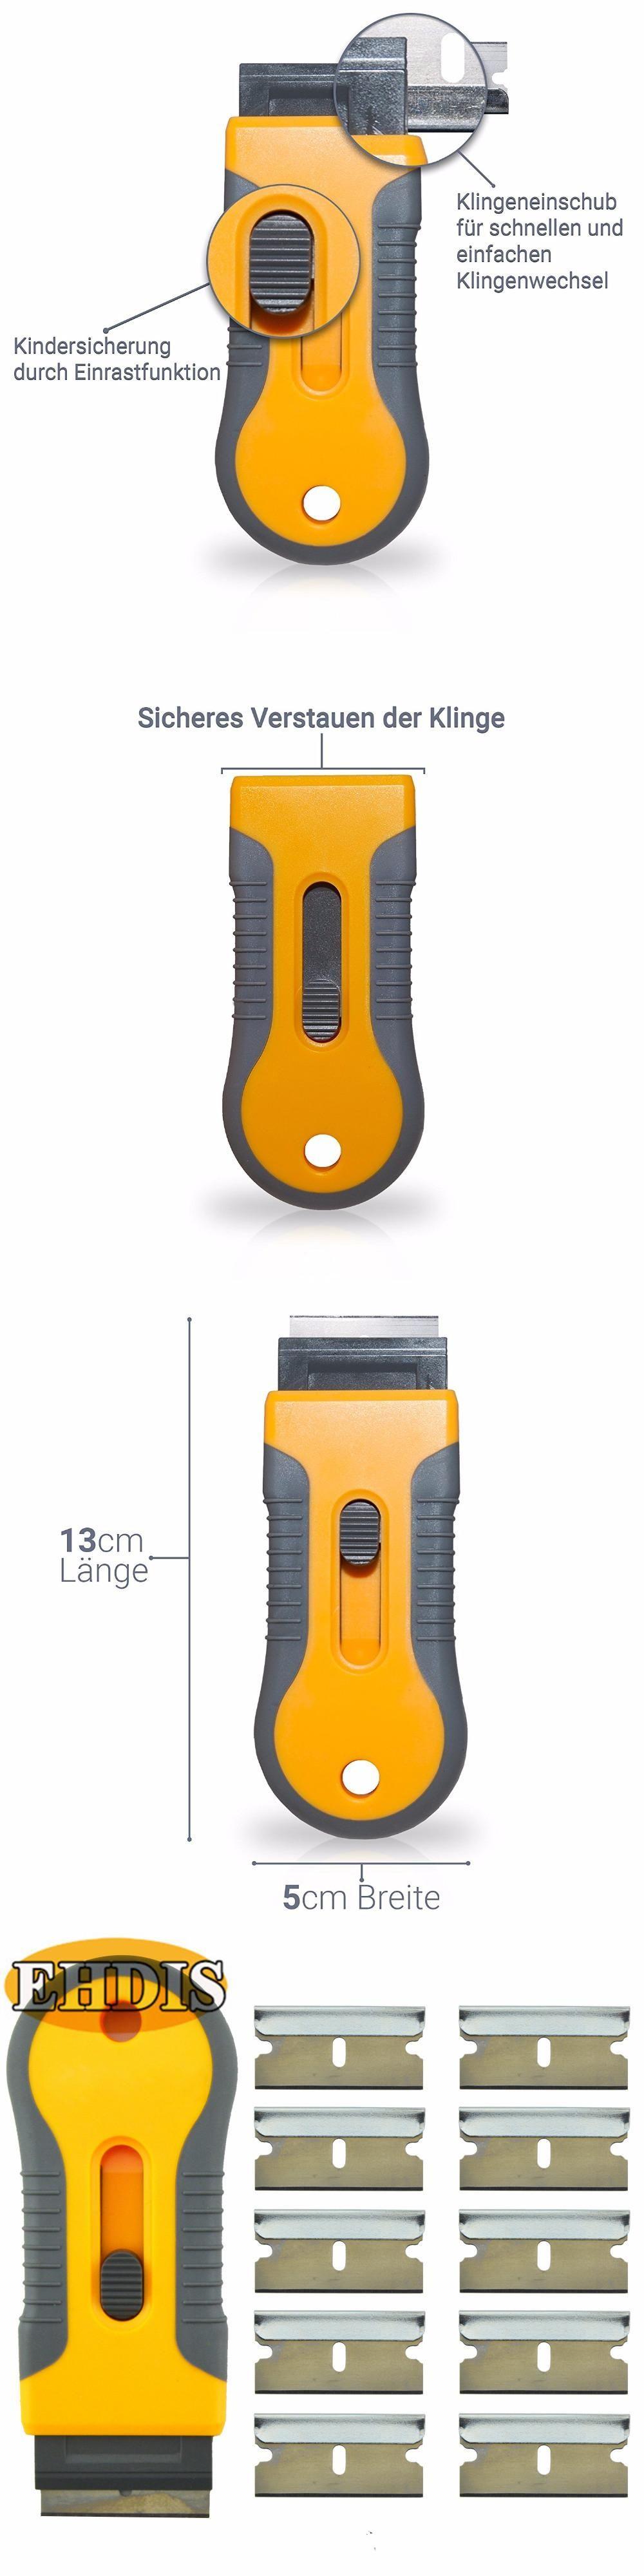 Ehdis car sticker wrap scraper with 10pcs razor blades